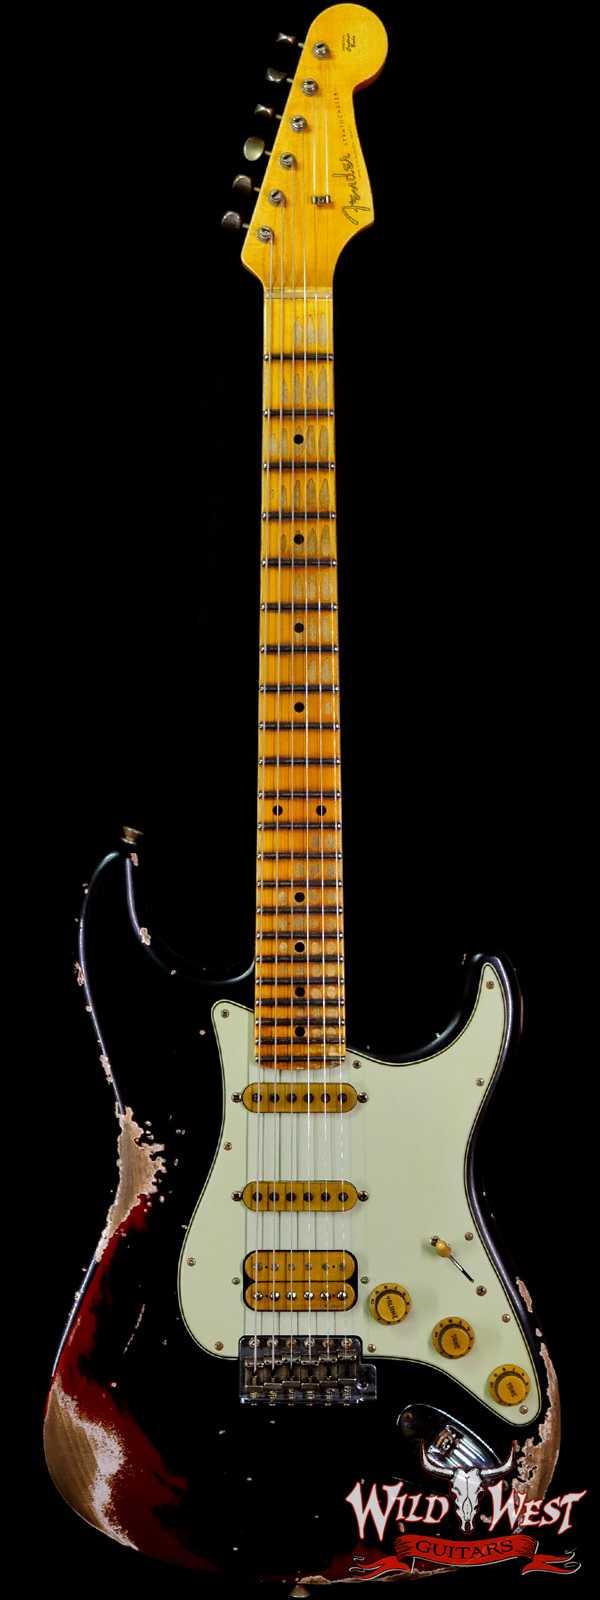 Fender Custom Shop Wild West Black Lightning 2.0 Stratocaster HSS Maple Board 22 Frets Heavy Relic Candy Apple Red